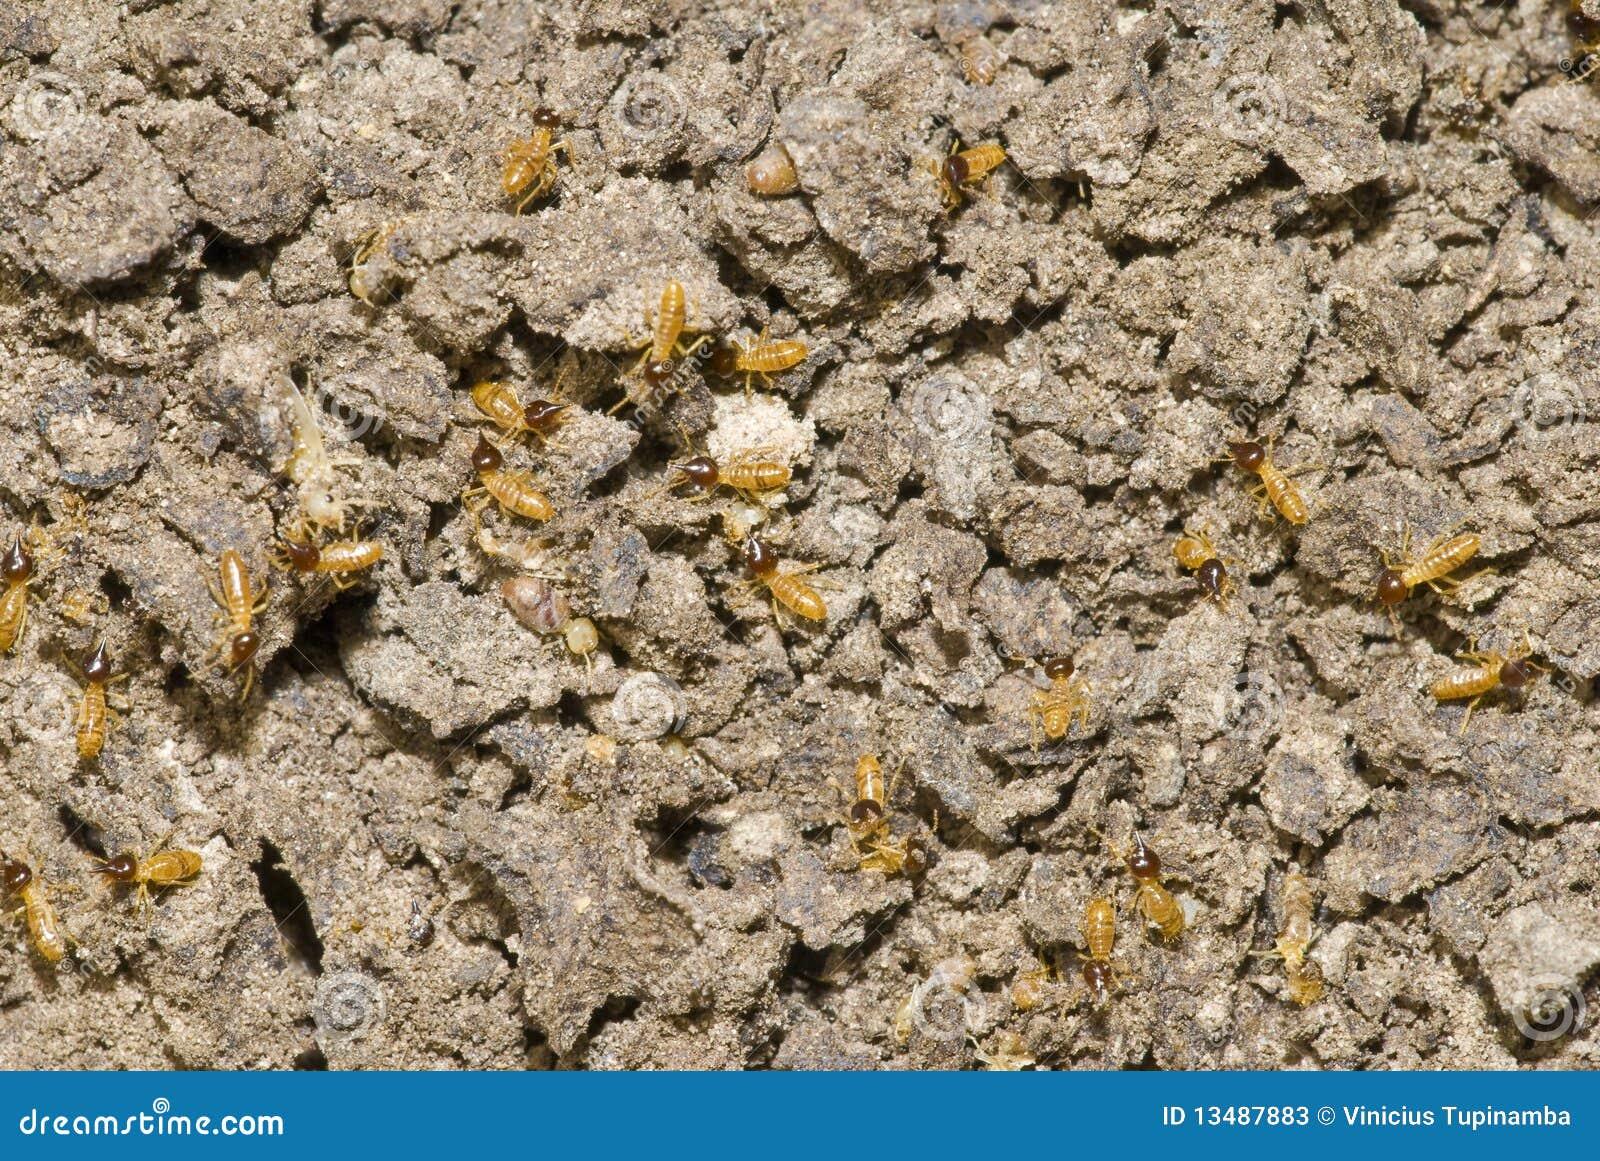 Kolonitermites